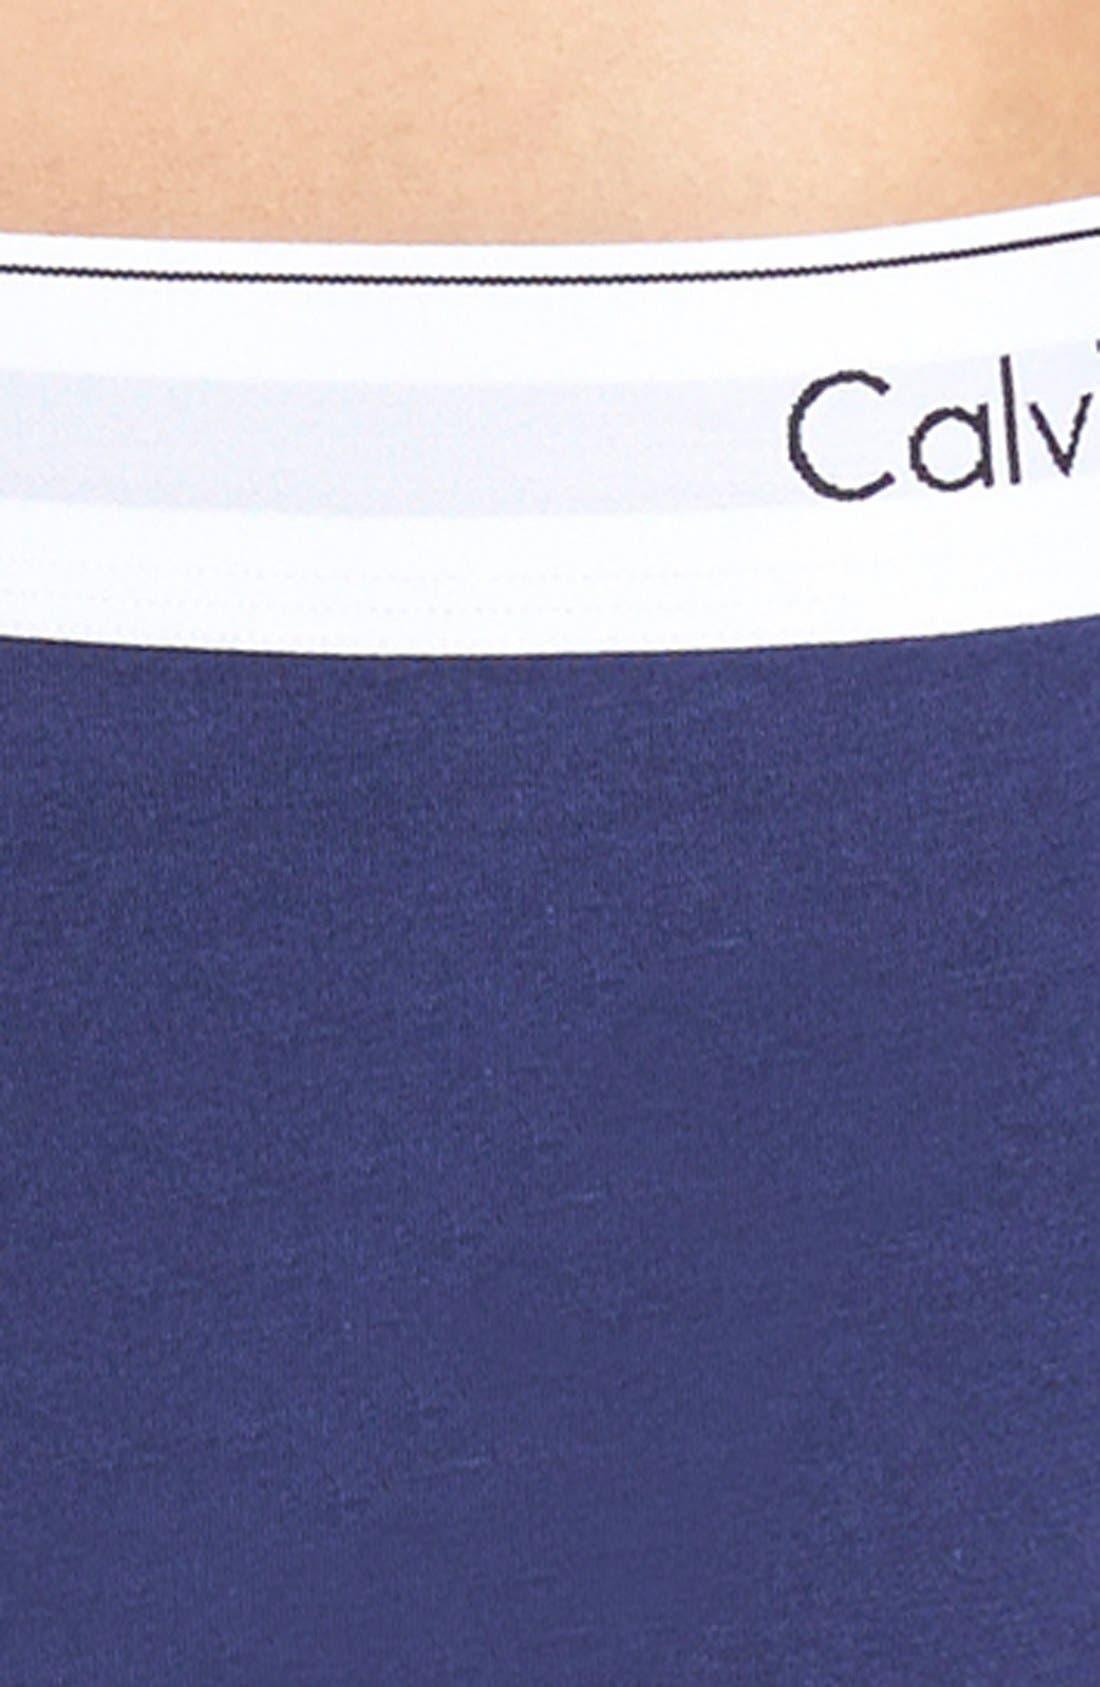 Modern Cotton Collection Boyshorts,                             Alternate thumbnail 64, color,